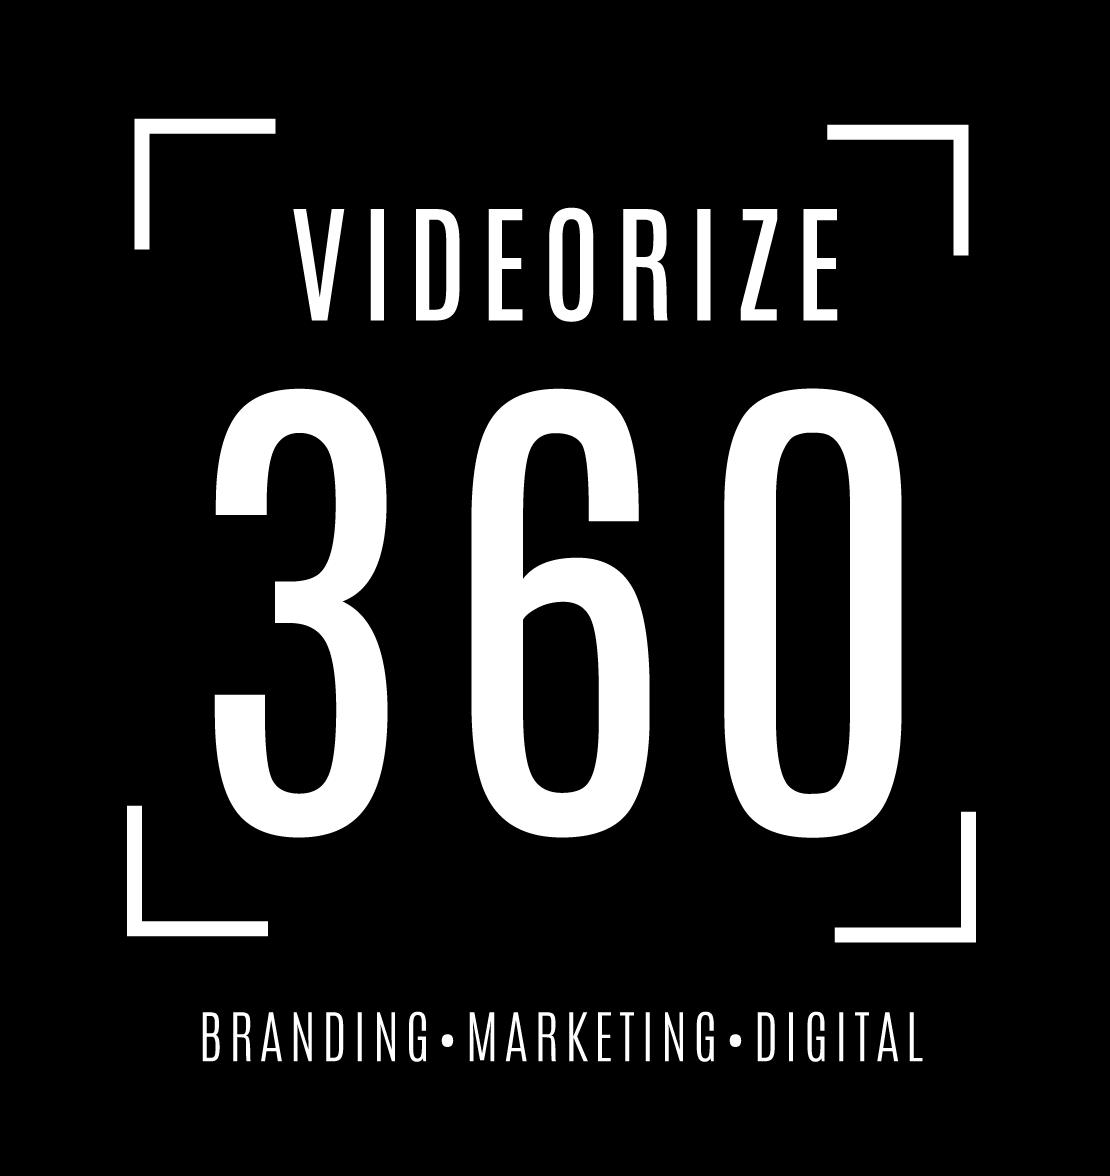 Vidoerize 360.png